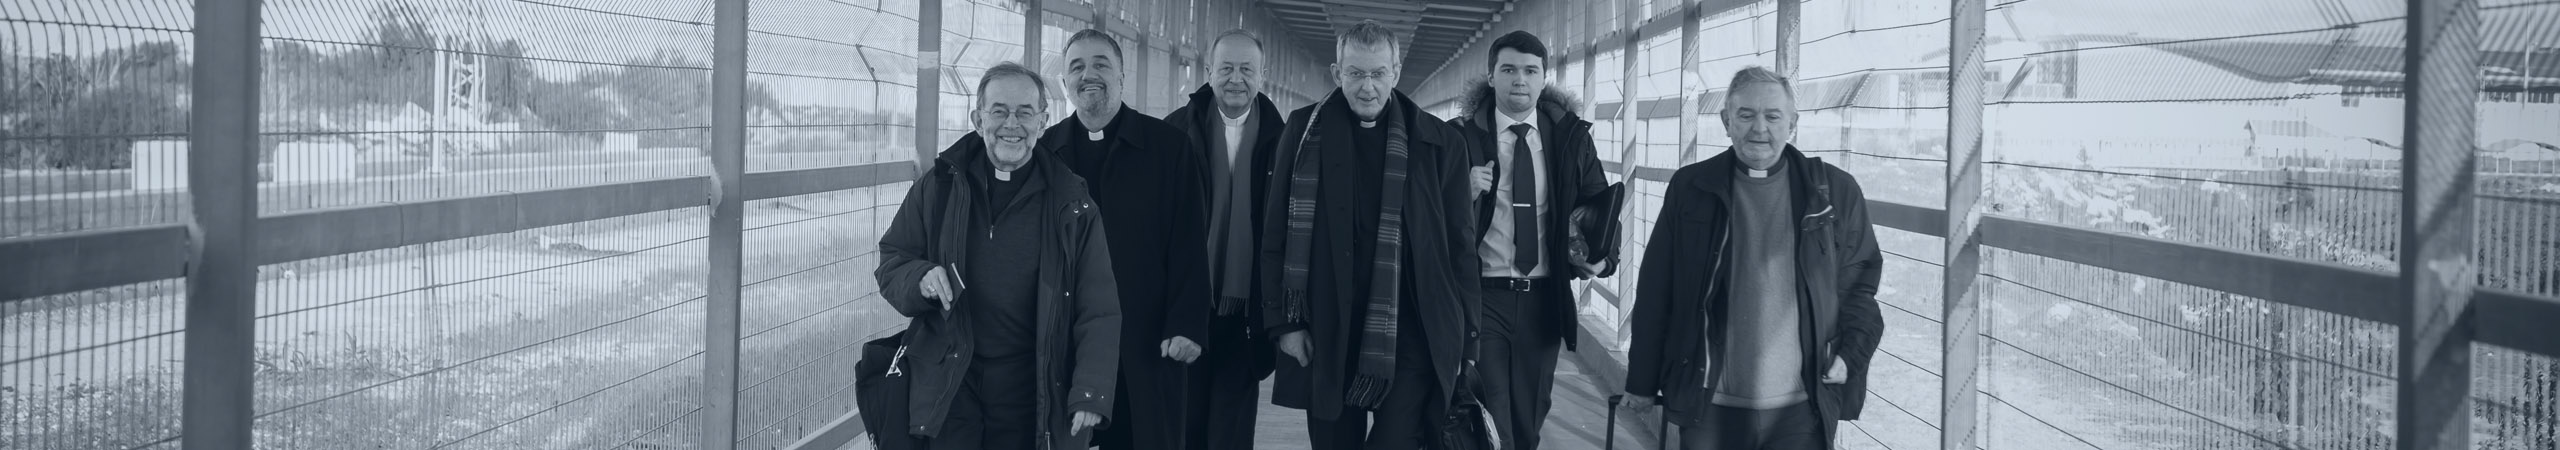 Bishops walk from Erez to Gaza